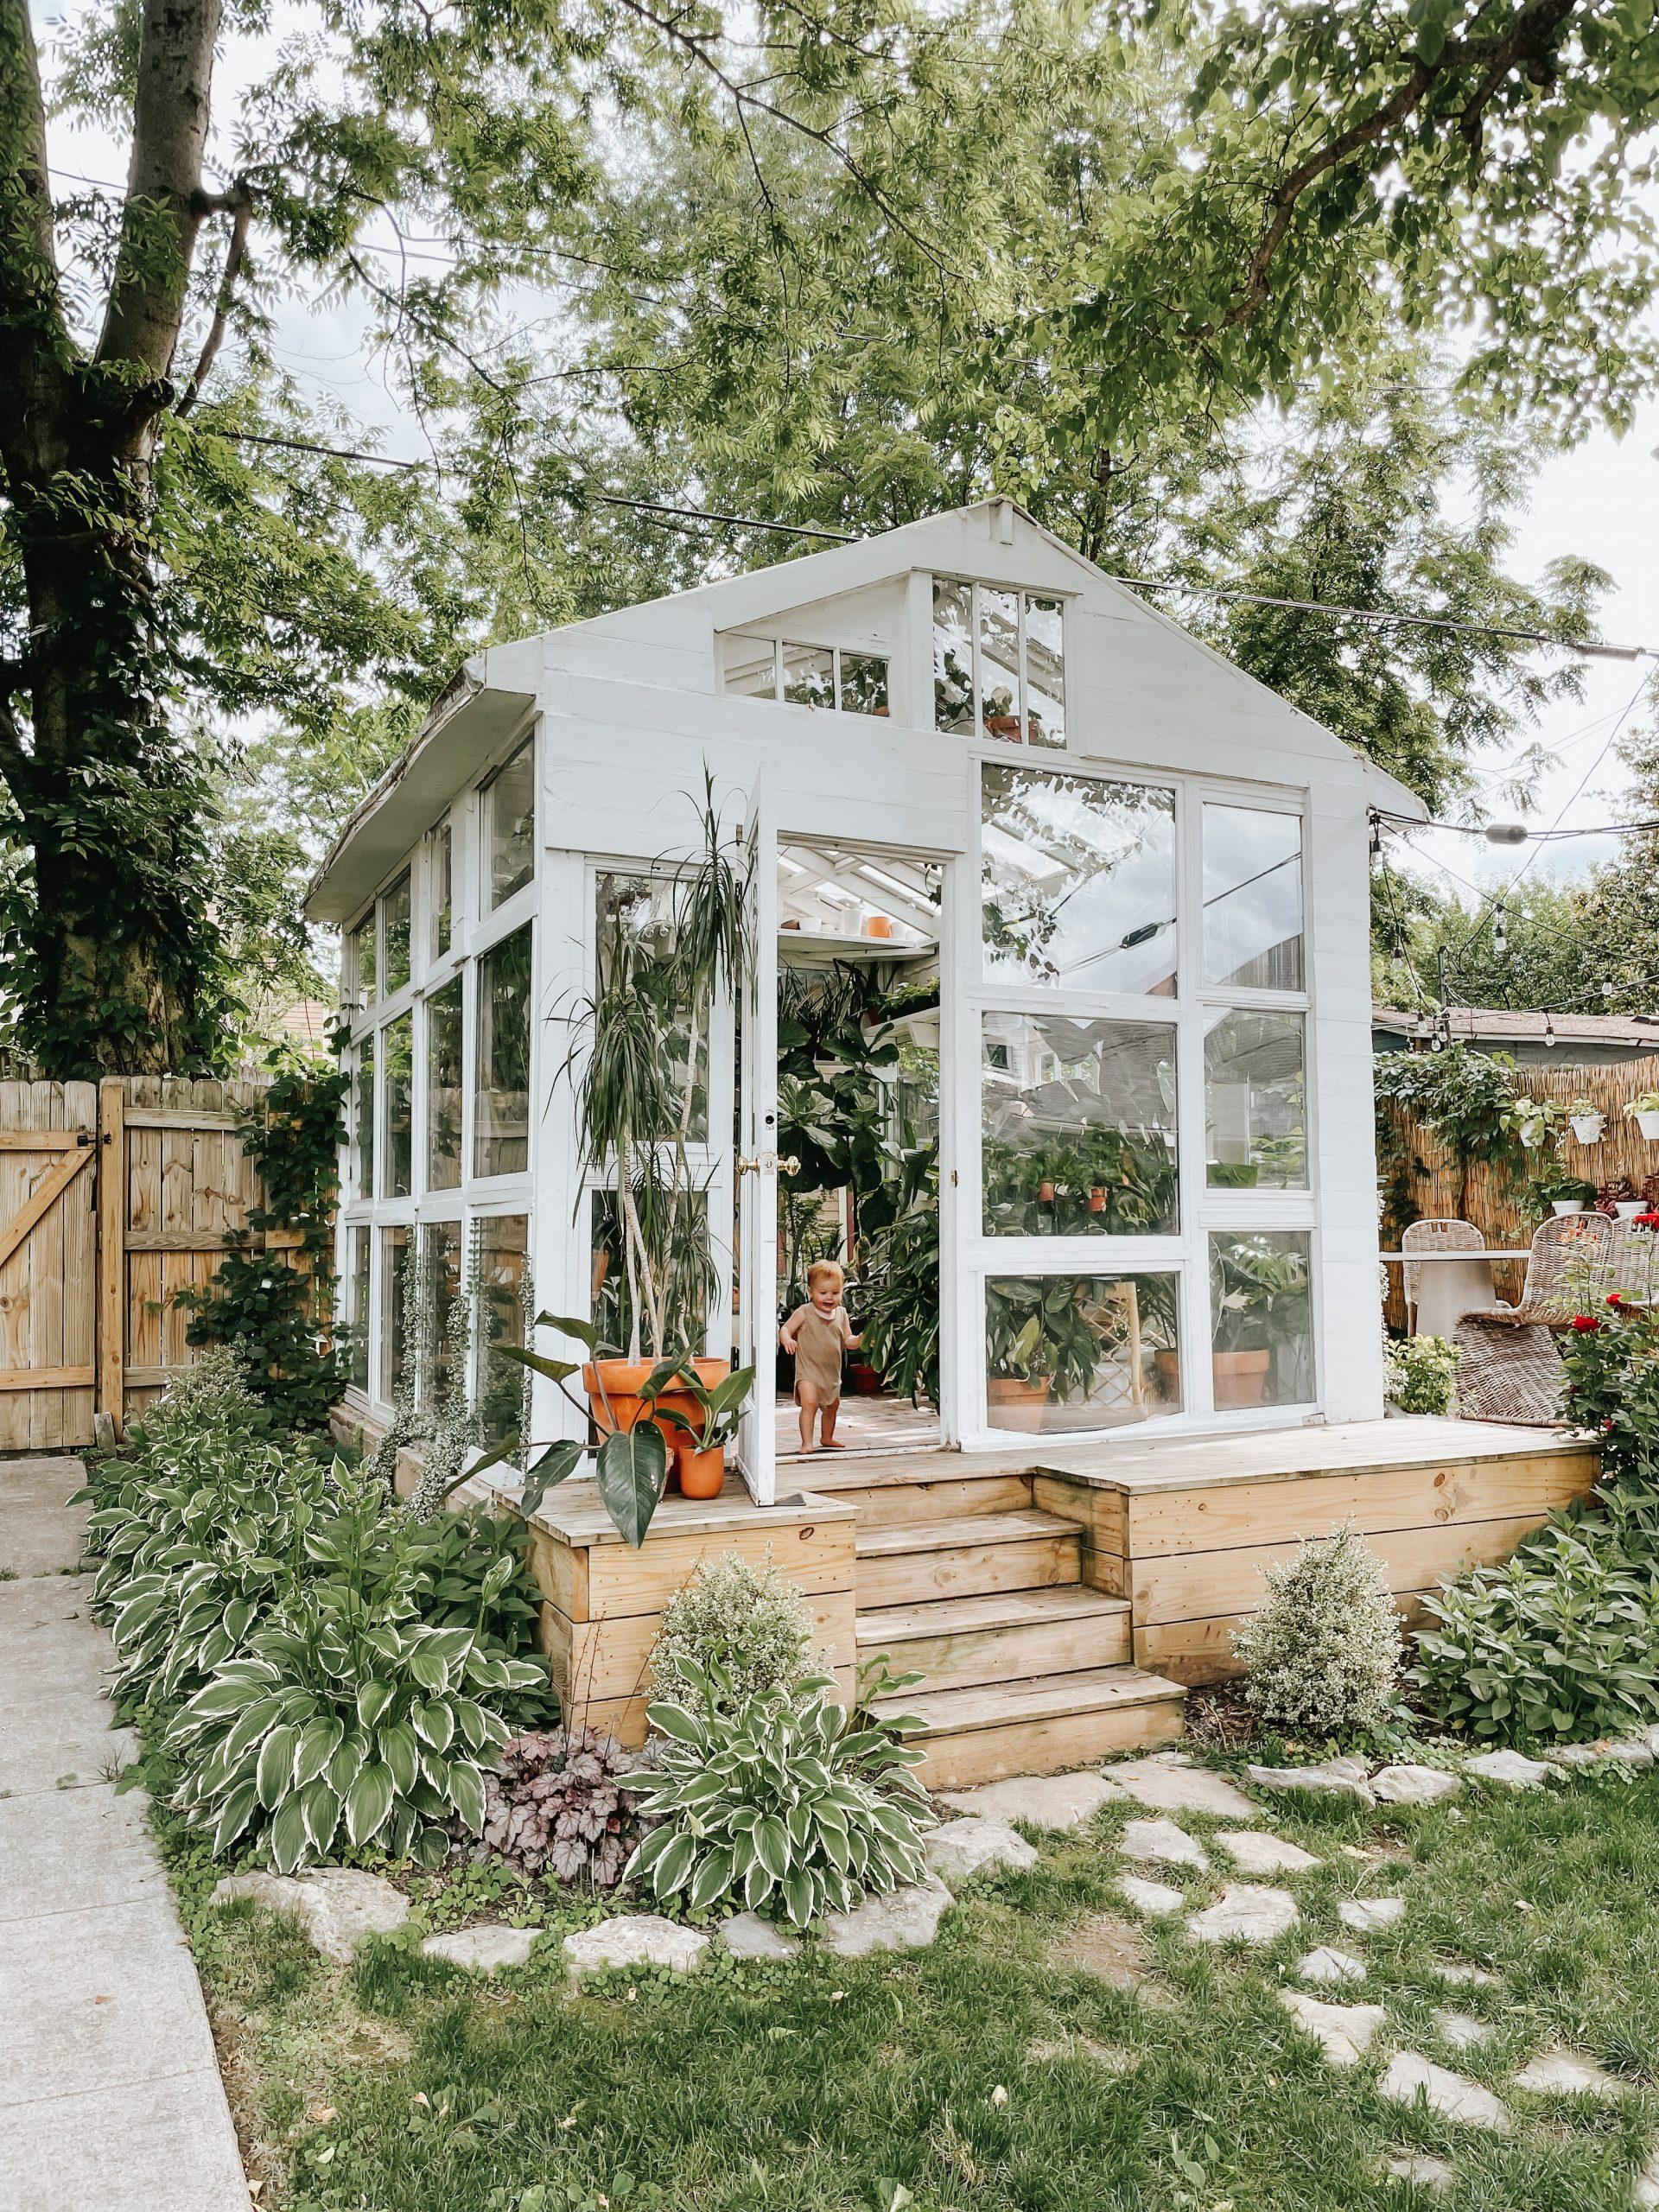 East Nashville Greenhouse plants backyard greenhouse